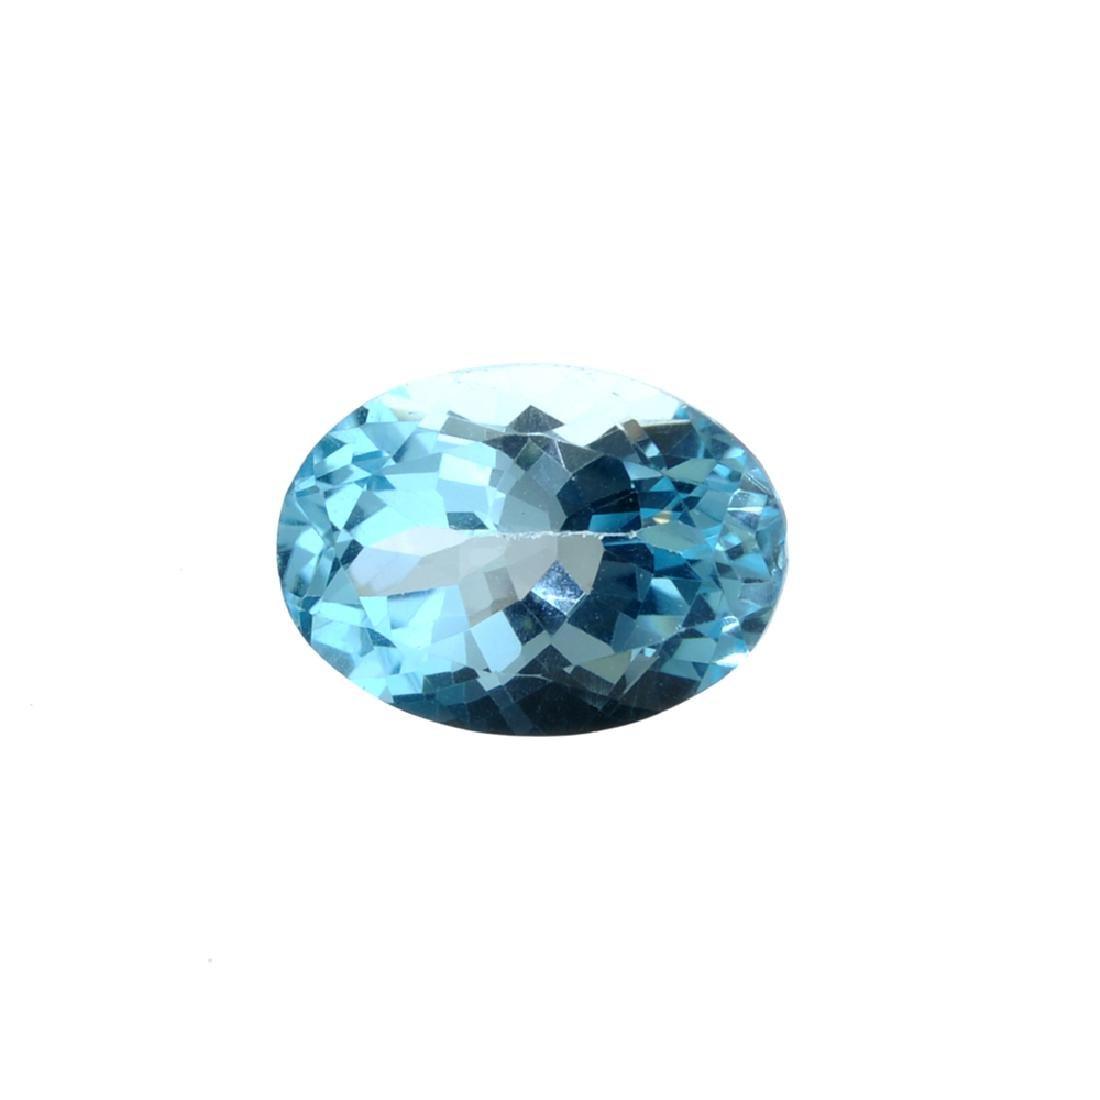 APP: 0.5k 15.42CT Oval Cut Blue Topaz Gemstone